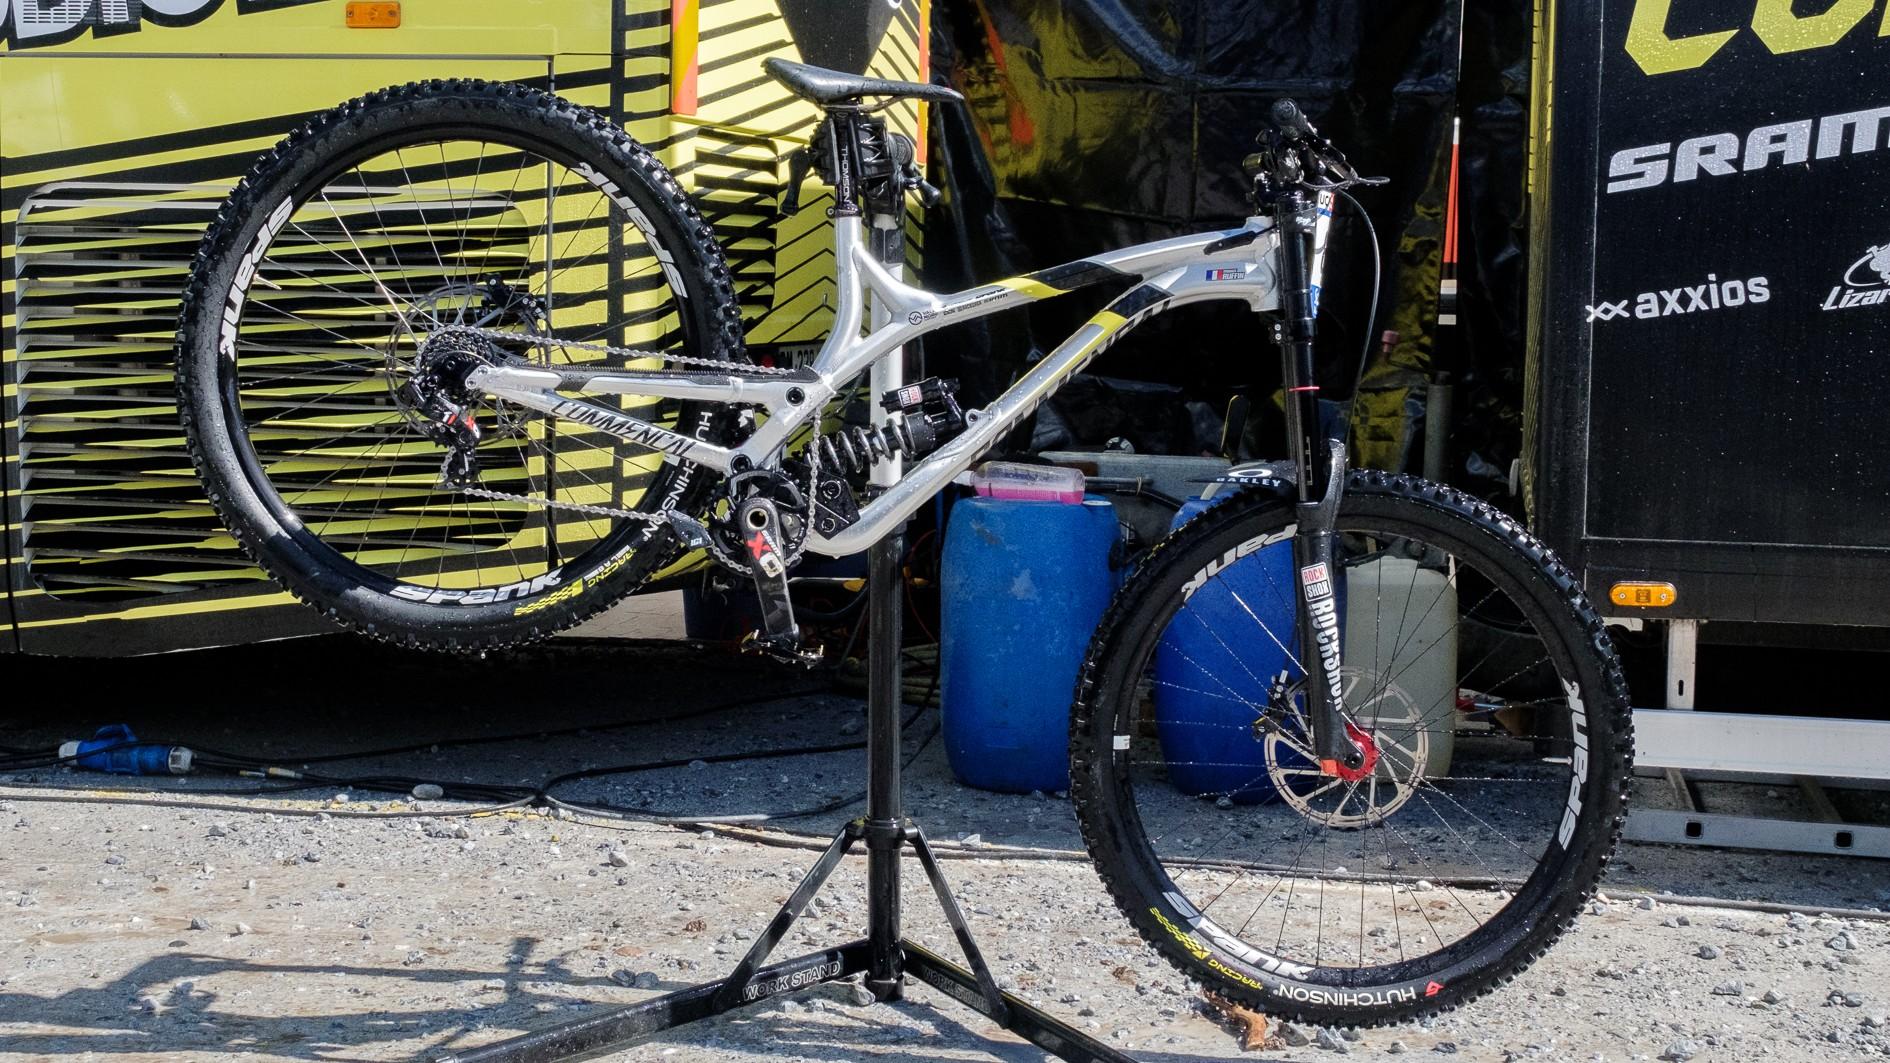 top-5-29er-dh-bikes-5-_-1499250044816-48hbh58ga7wc-25ee9f1